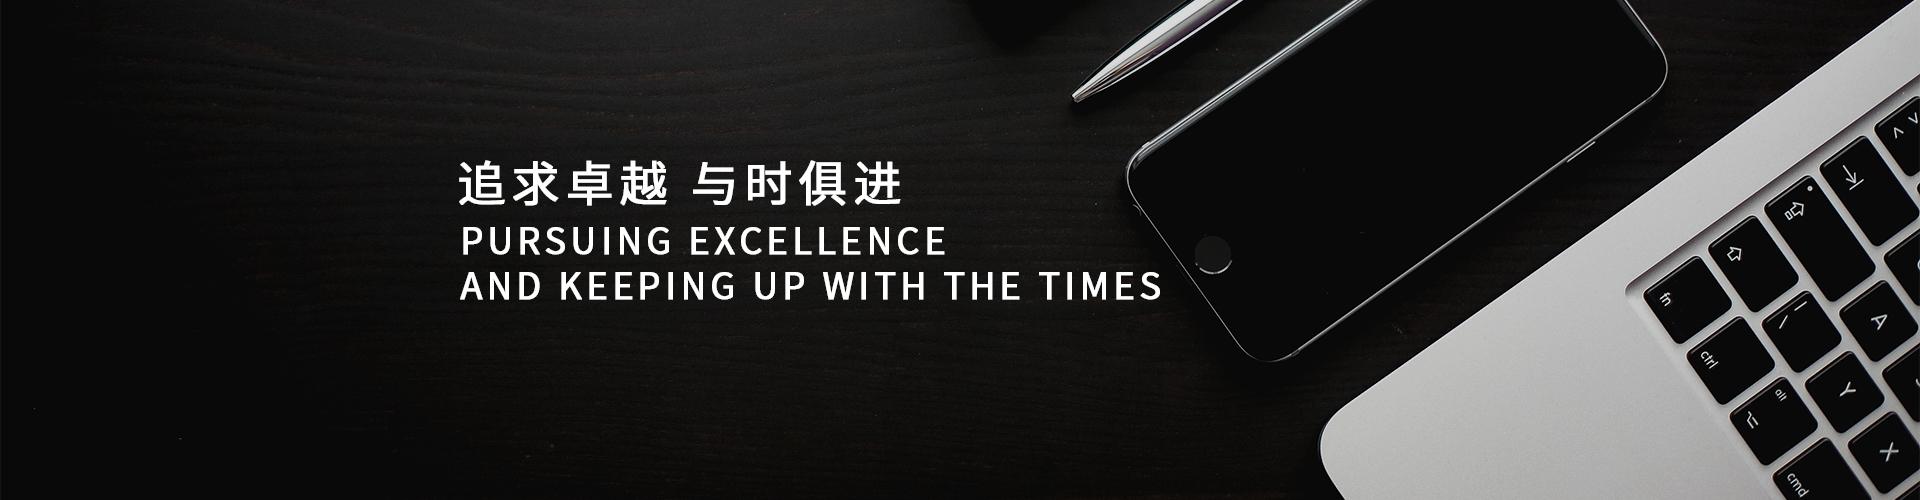 子banner-新聞中心